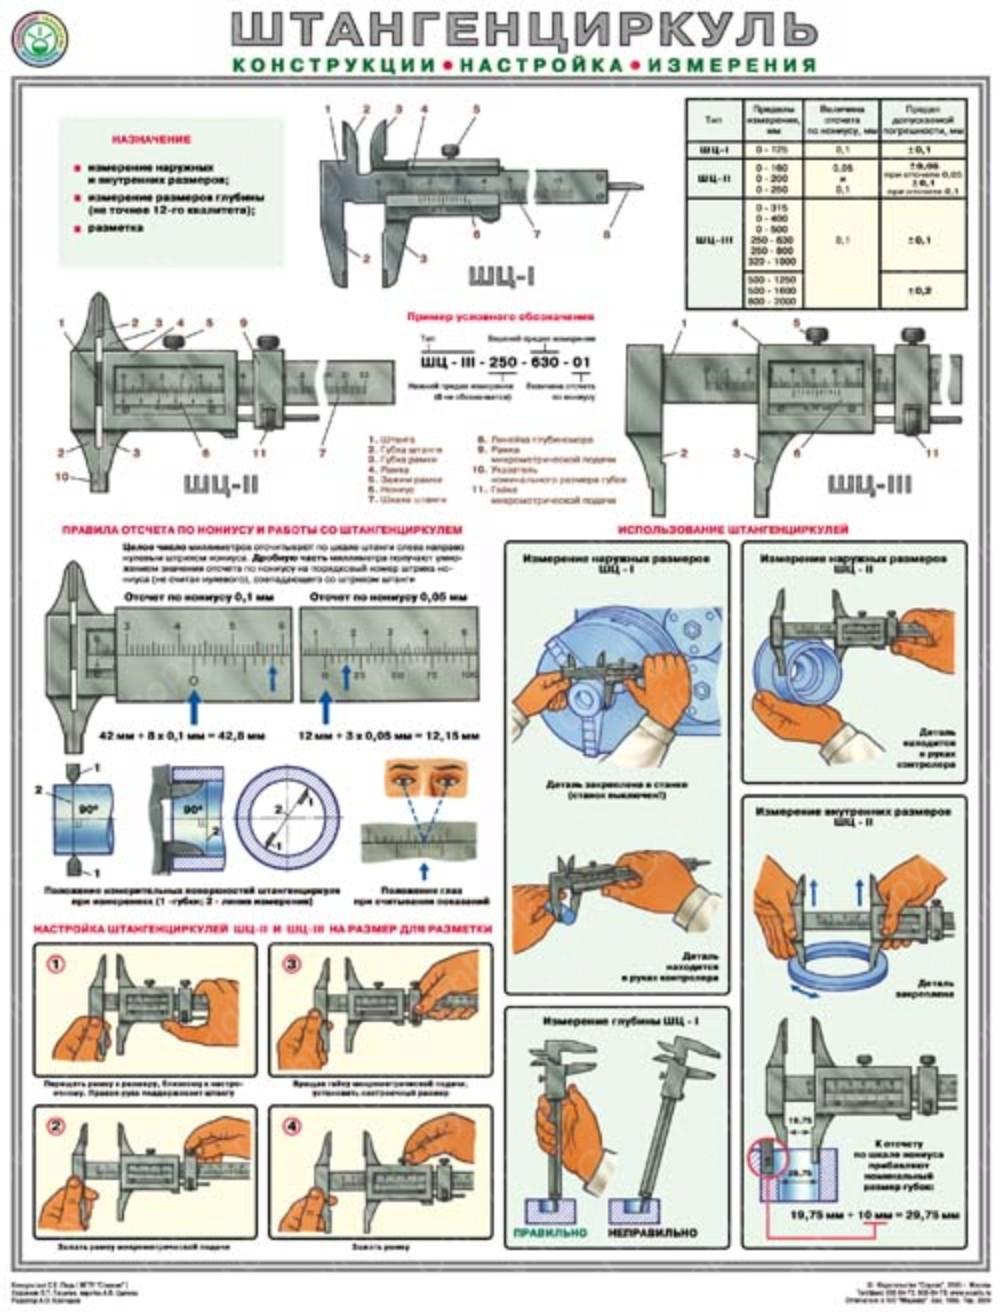 Схема от штангенциркуля